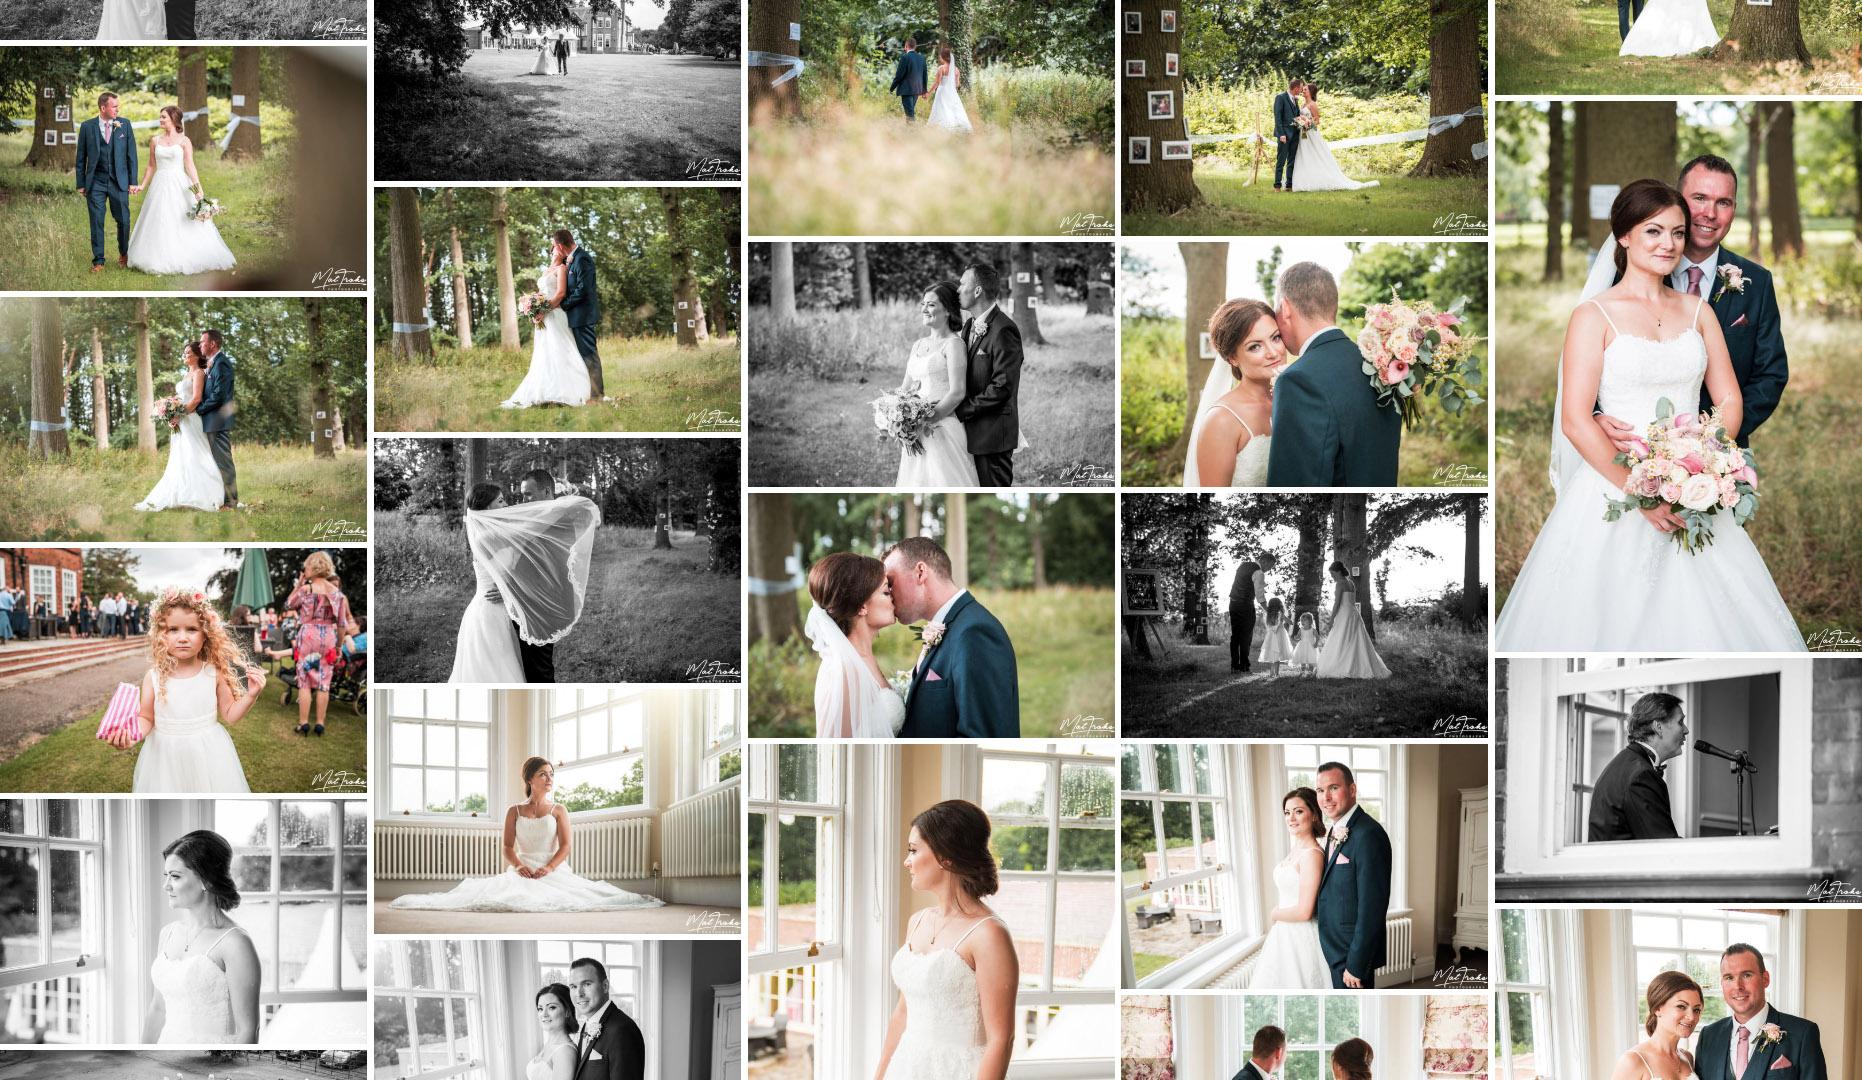 Derbyshire-wedding-photography-nottinghamshire-photographer-derby-notts (5).jpg